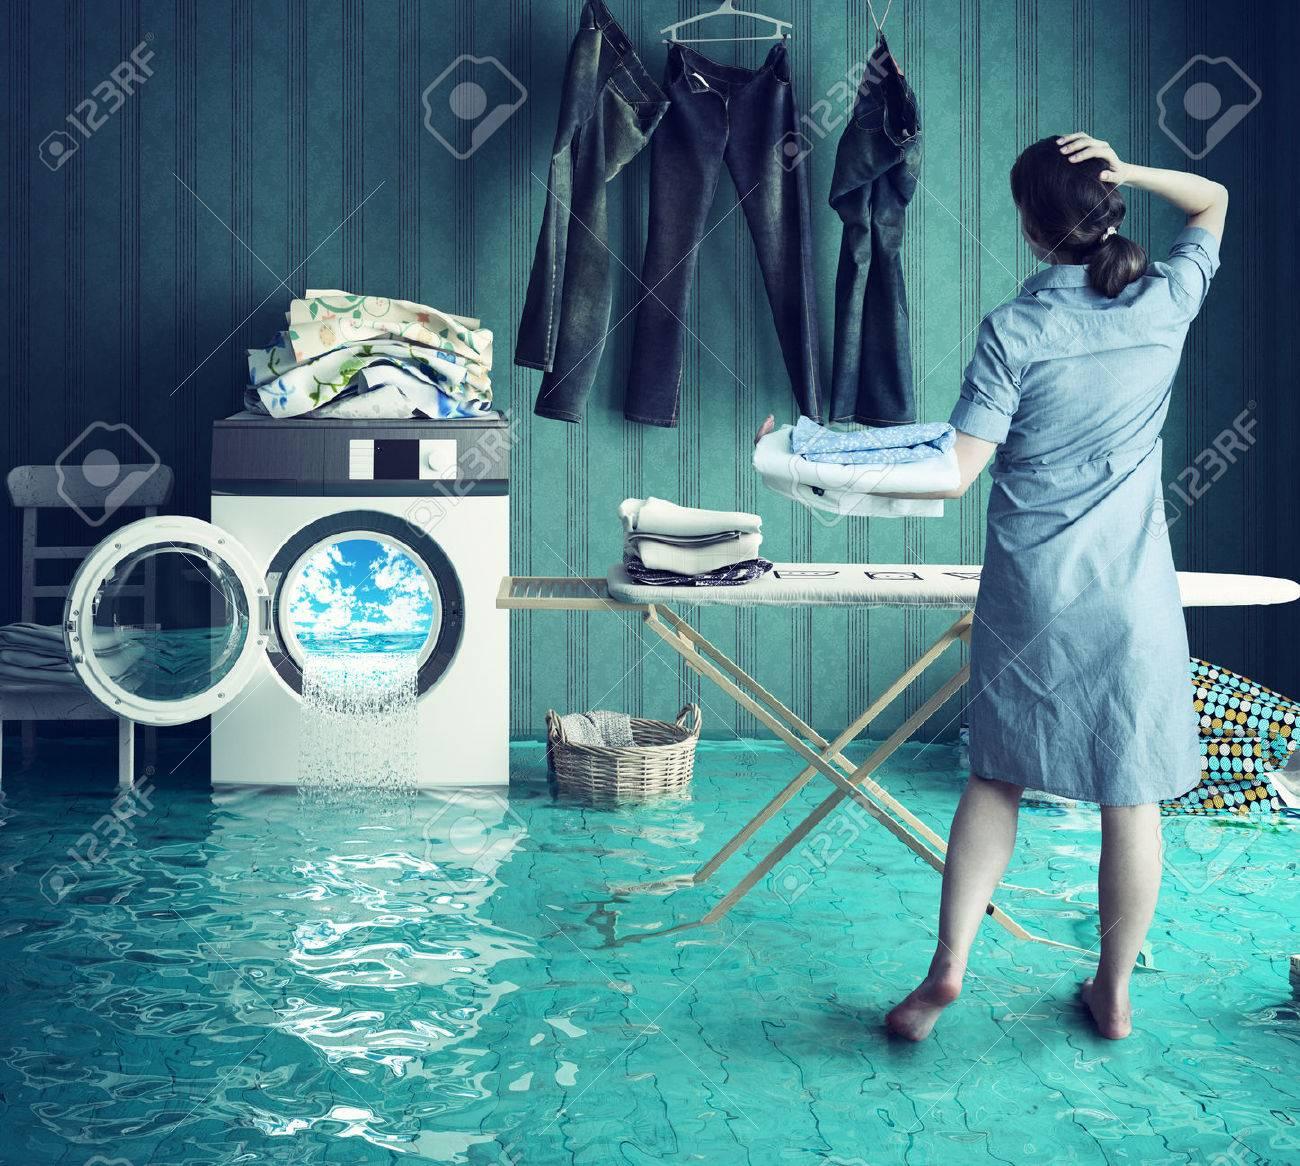 Housewife`s dreams. Creative concept. Photo combination Standard-Bild - 44925999